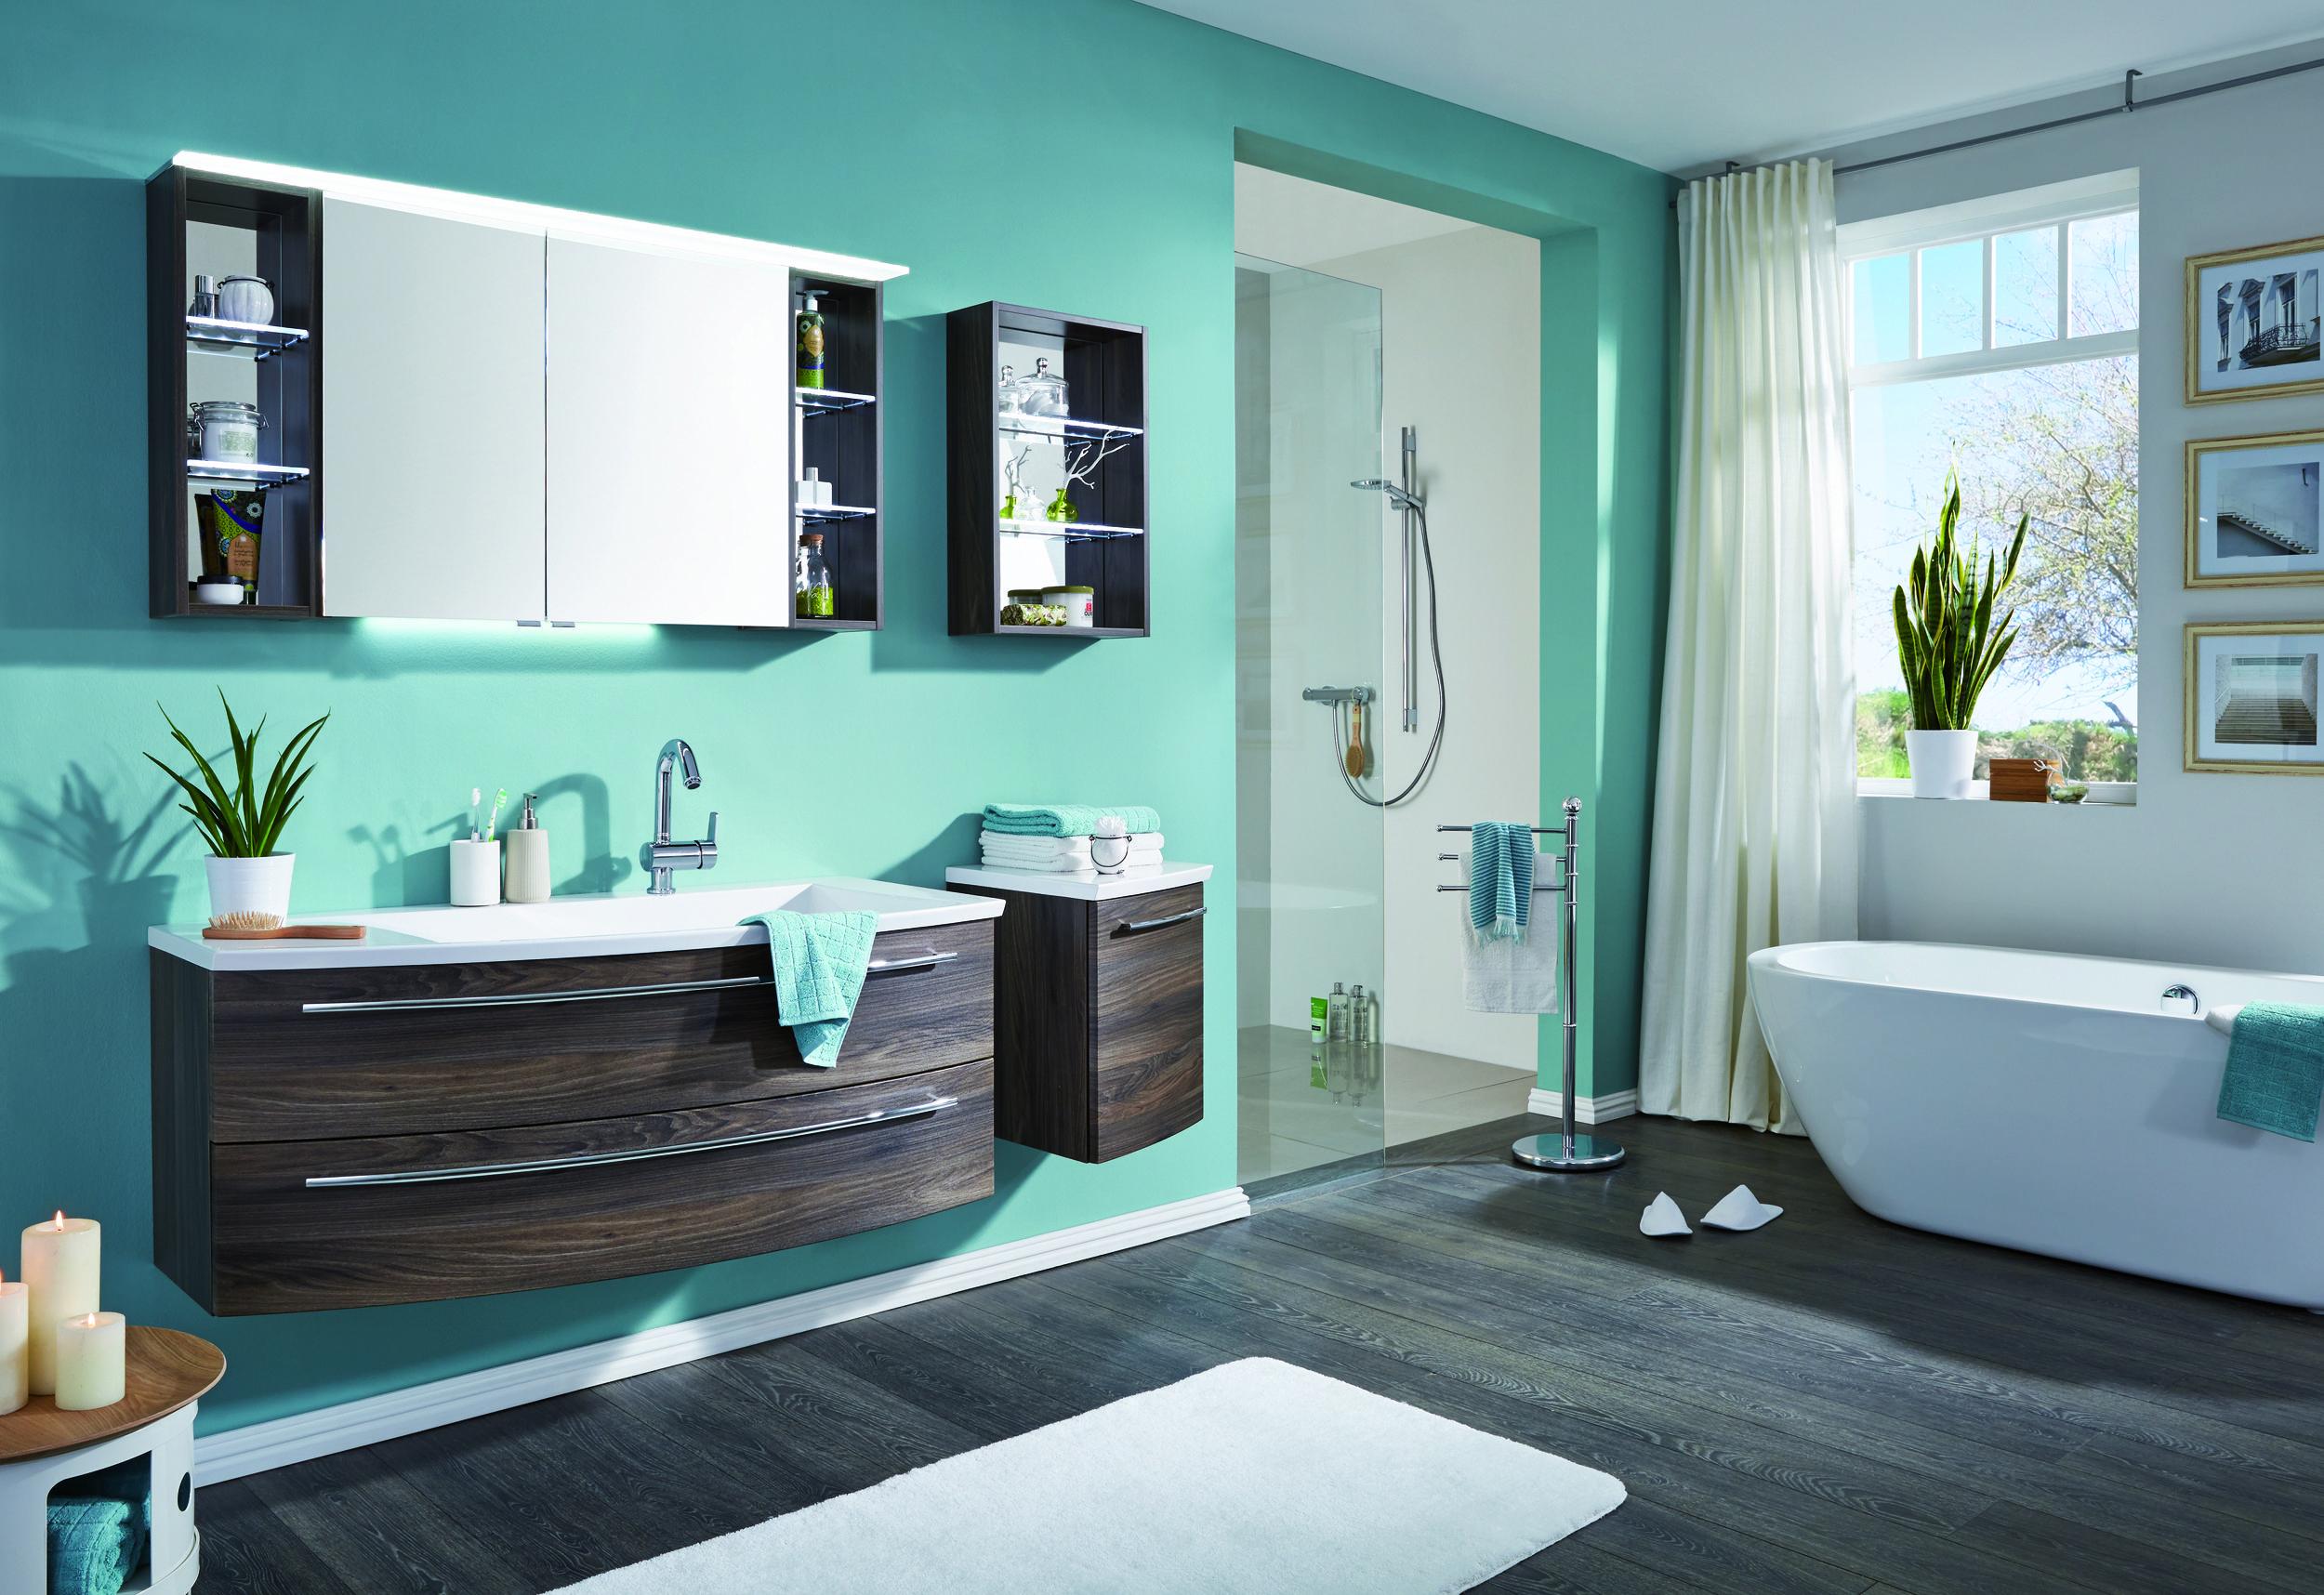 Meuble Salle De Bain Kub ~ kopalnica puris crescendo moj mir v moji kopalnici kopalni ka